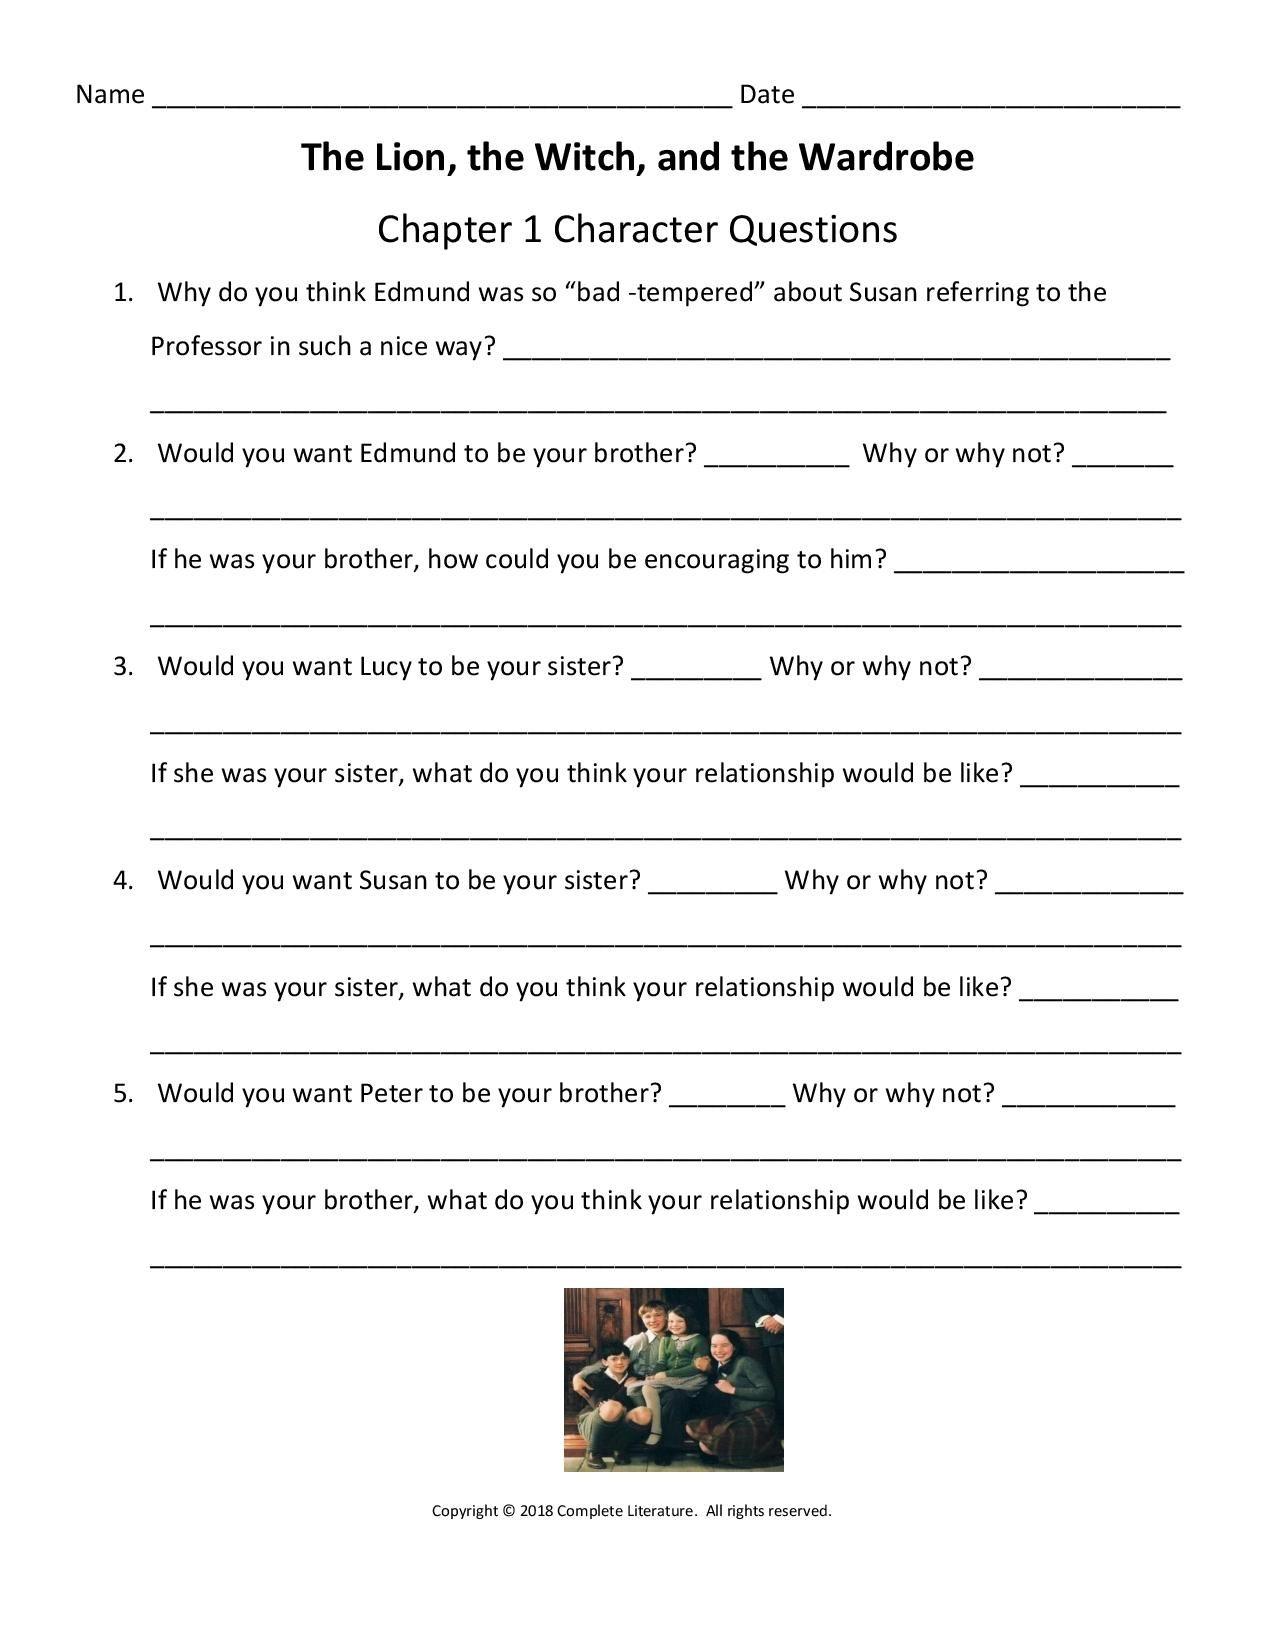 Narnia Worksheet Character Questions Essay Starters Literature Lessons Ela Worksheets [ 1650 x 1275 Pixel ]